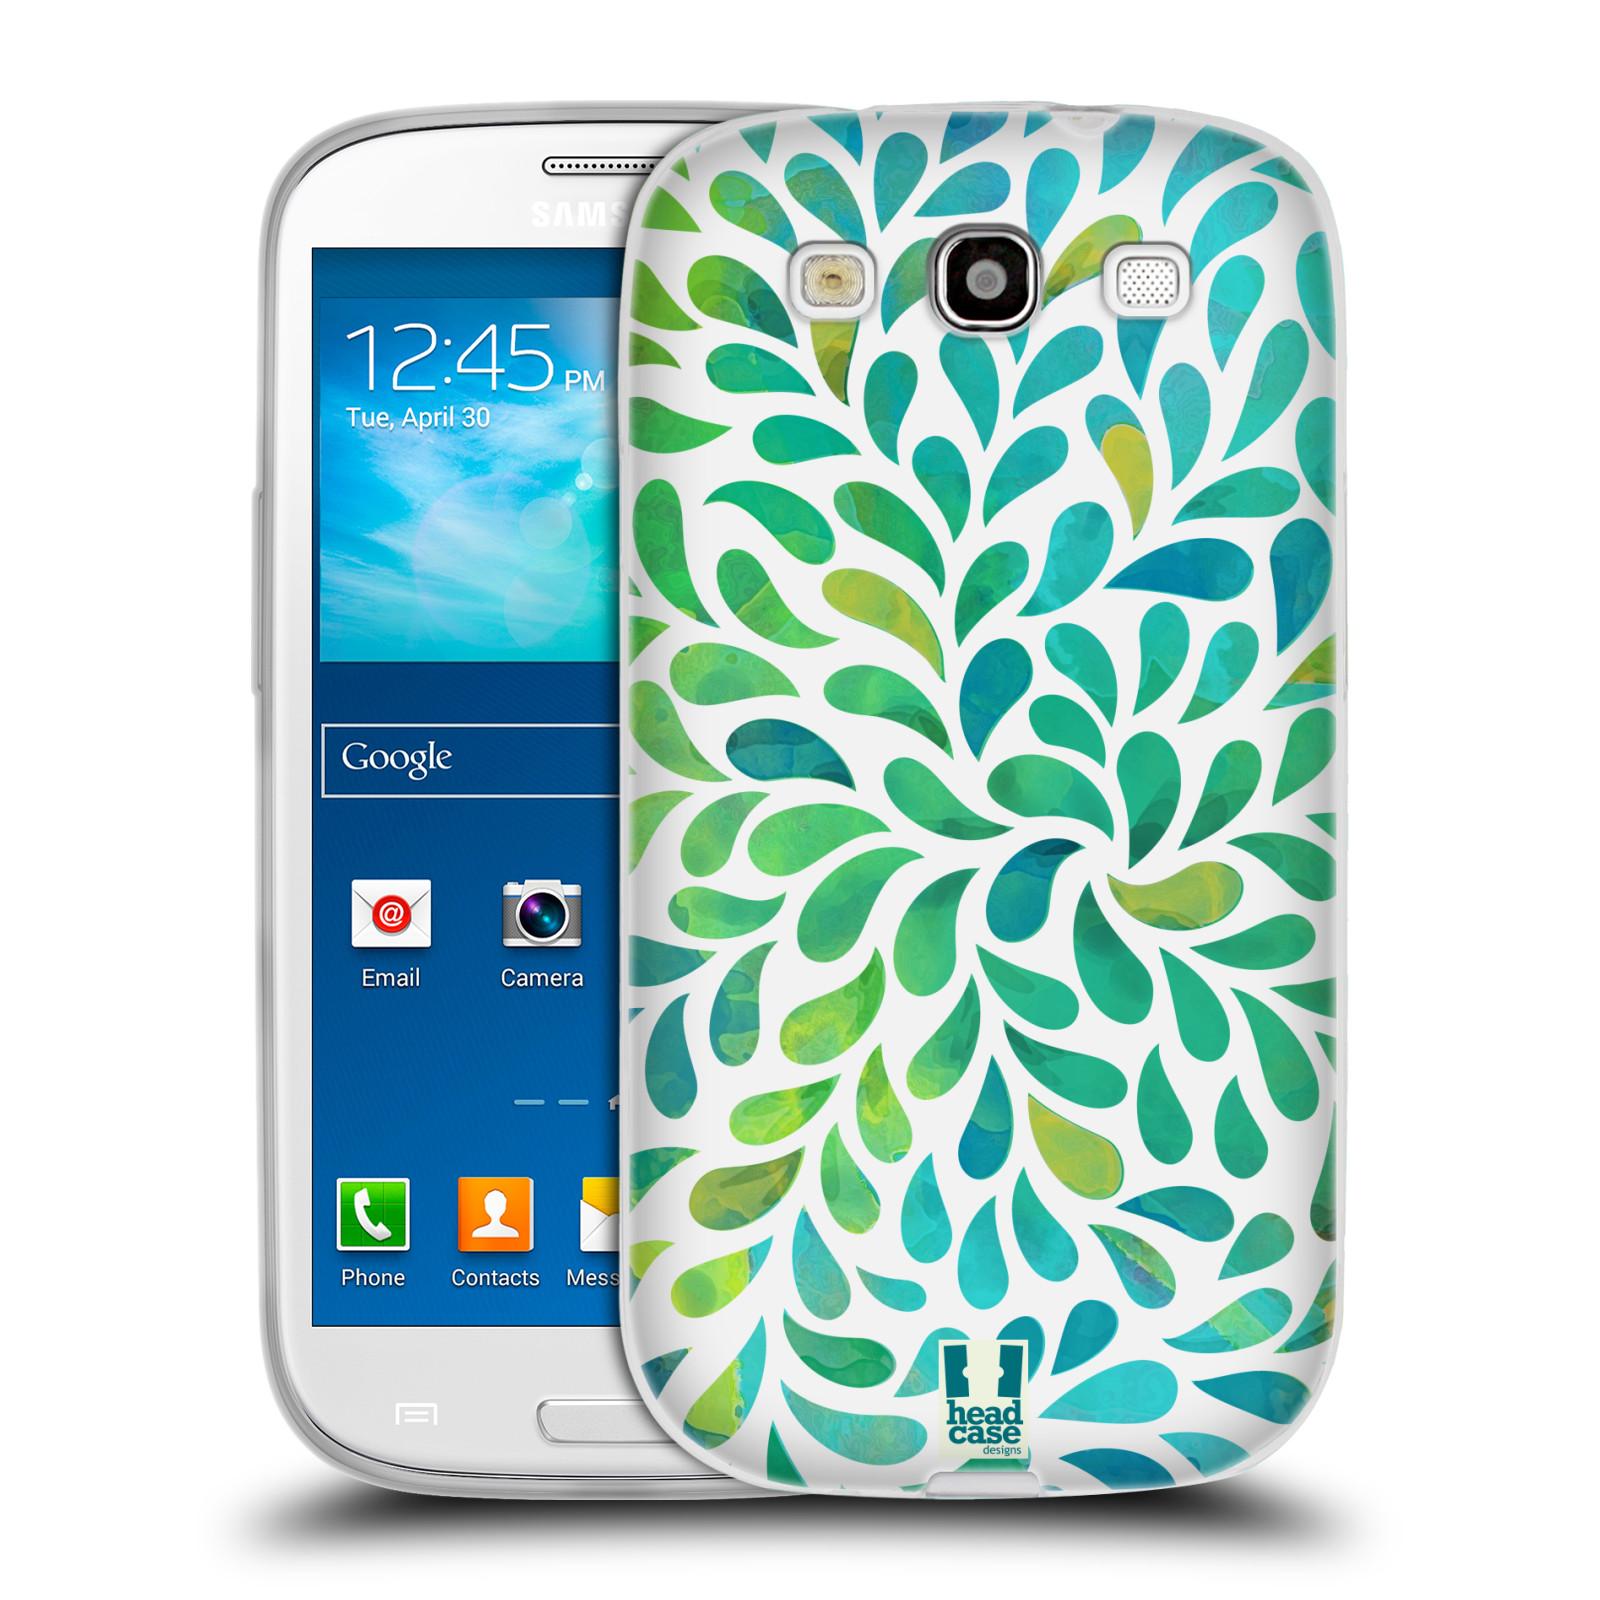 Silikonové pouzdro na mobil Samsung Galaxy S III HEAD CASE Droplet Wave Kapičky (Silikonový kryt či obal na mobilní telefon Samsung Galaxy S III GT-i9300)